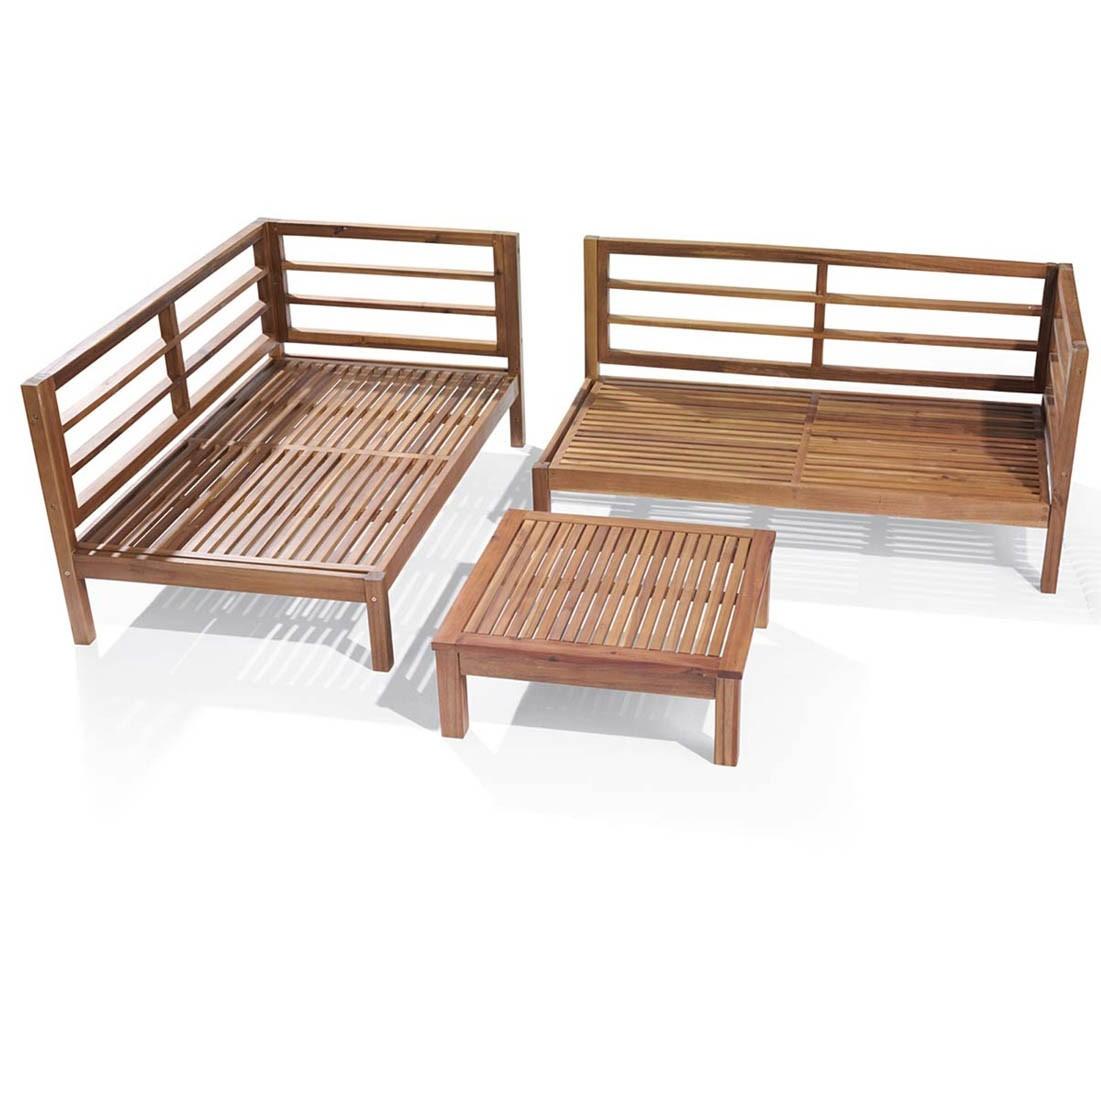 Full Size of Loungemobel Balkon Holz Caseconradcom Loungemöbel Garten Günstig Wohnzimmer Outliv Loungemöbel